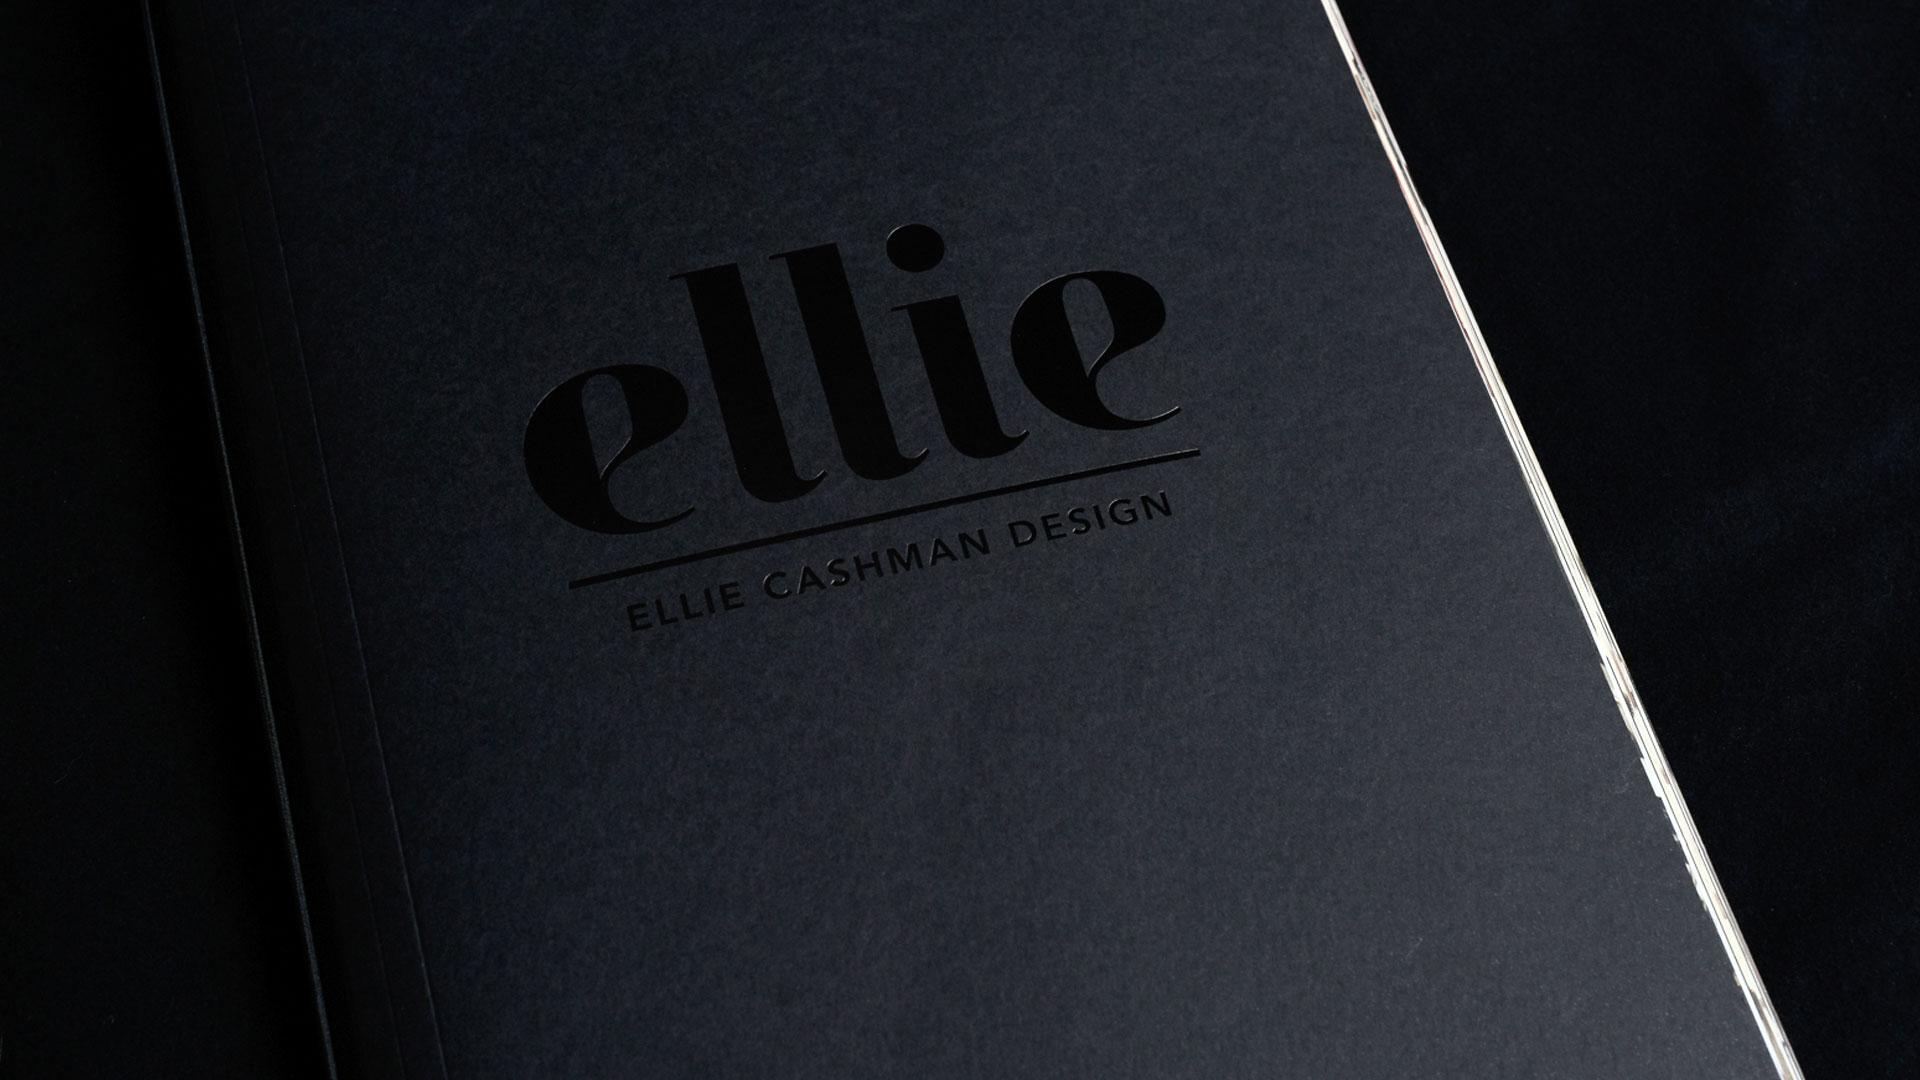 Ellie Cashman Design Identity - PaperSpecs